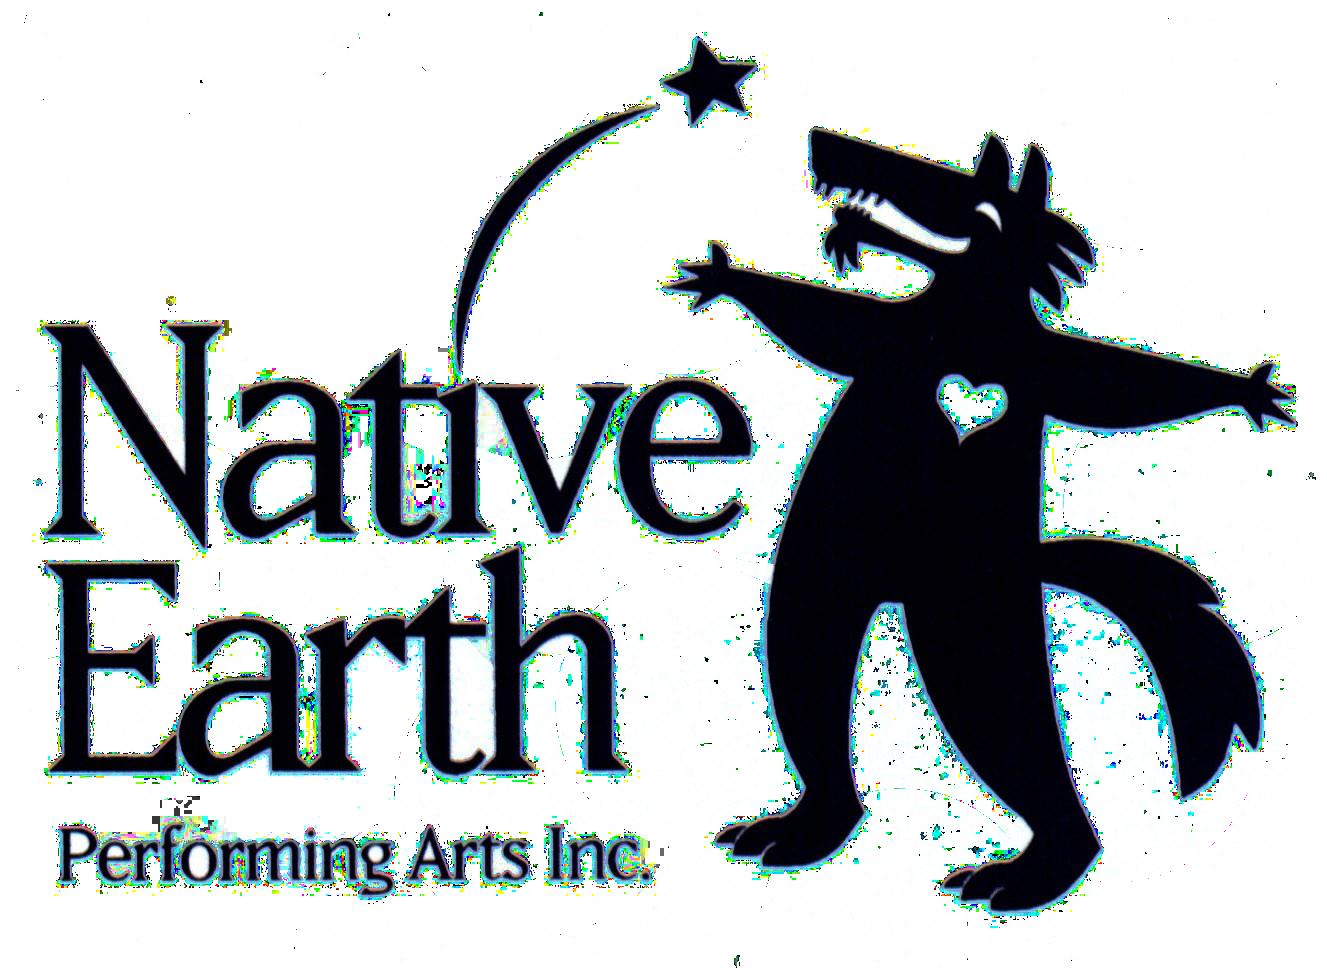 Performing arts logo